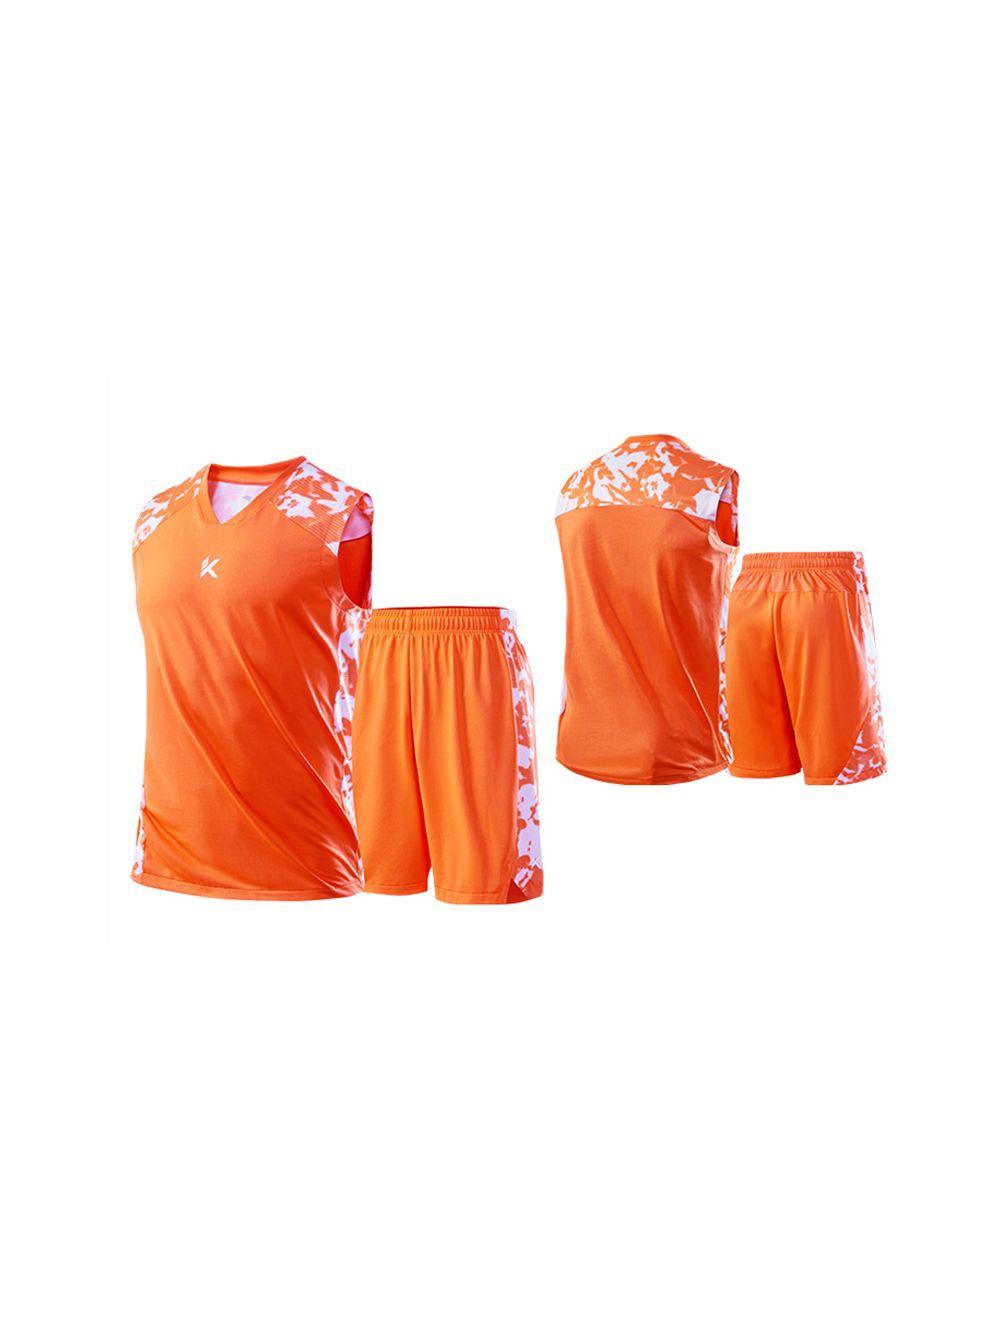 big sale 95384 d5b41 Anta Klay Thompson KT 2019 Men's Basketball Jersey & Shorts - Orange